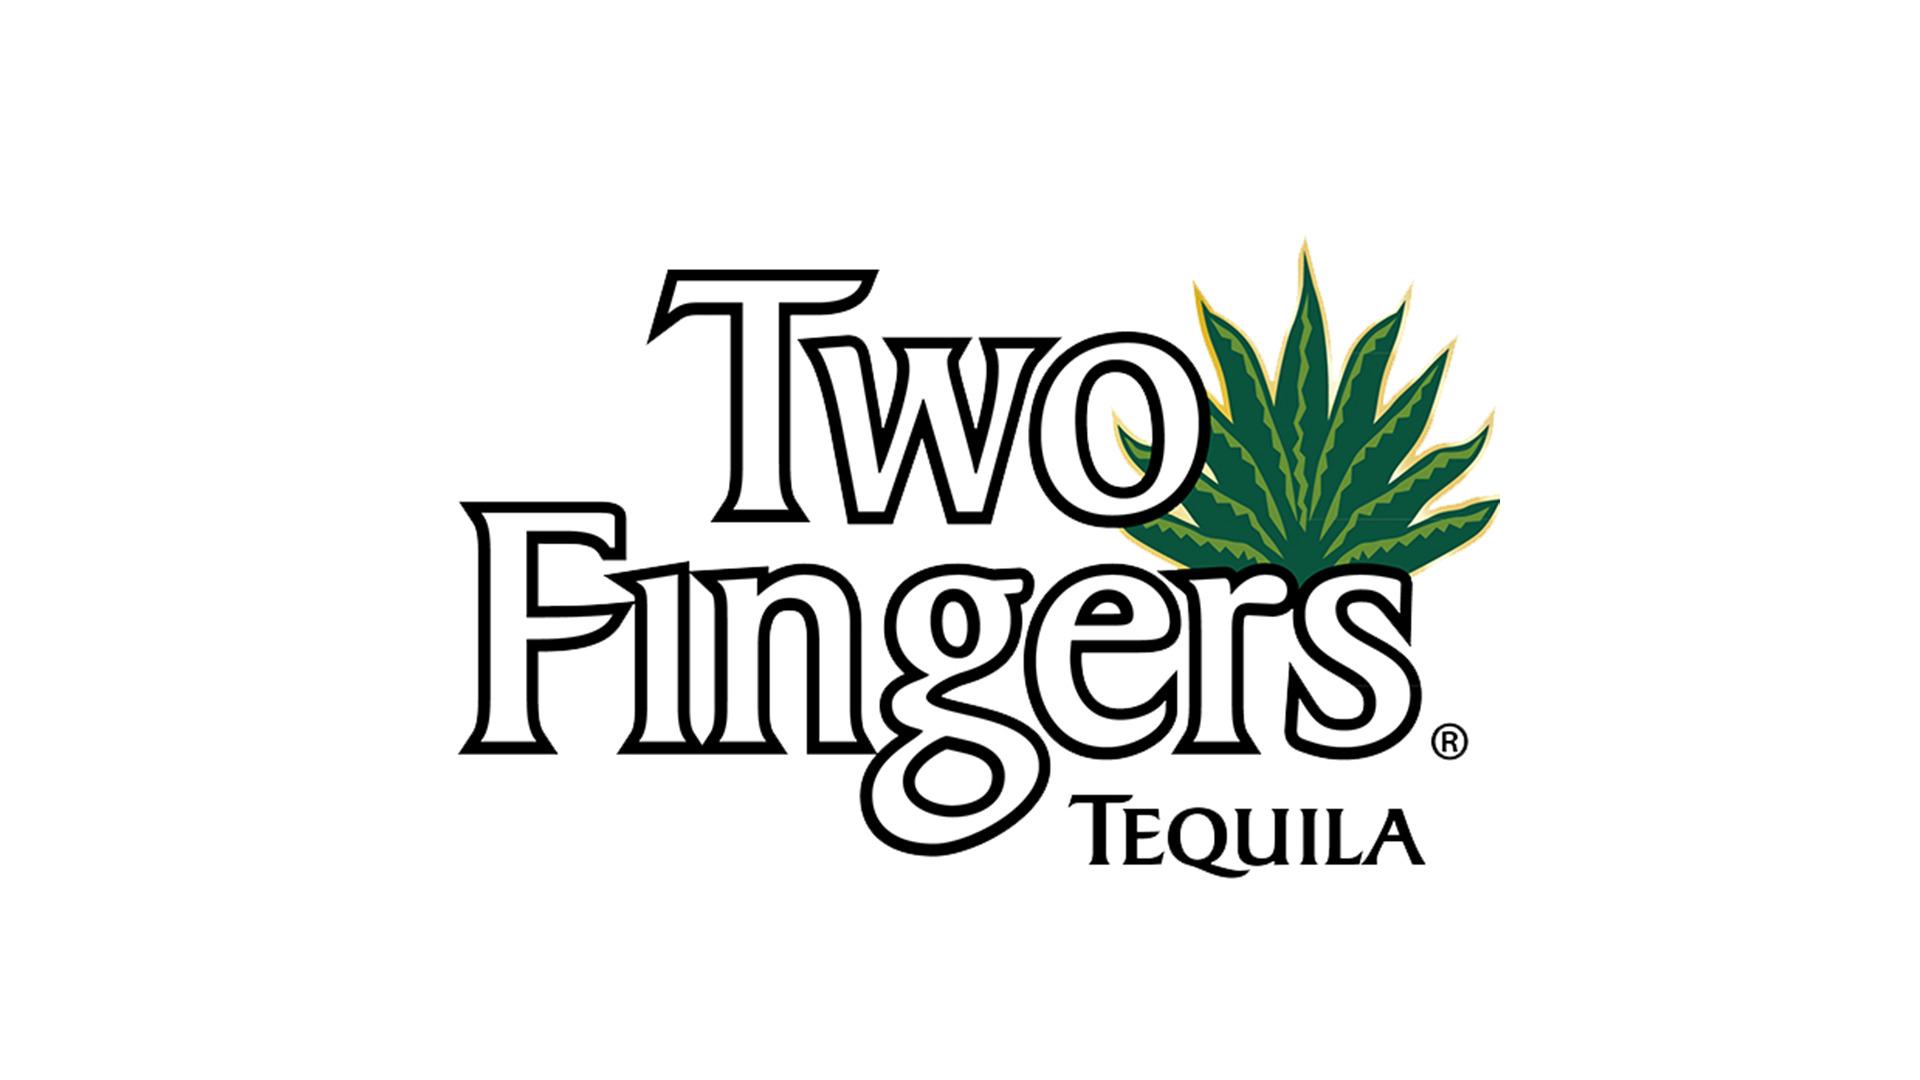 Rượu Two Fingers